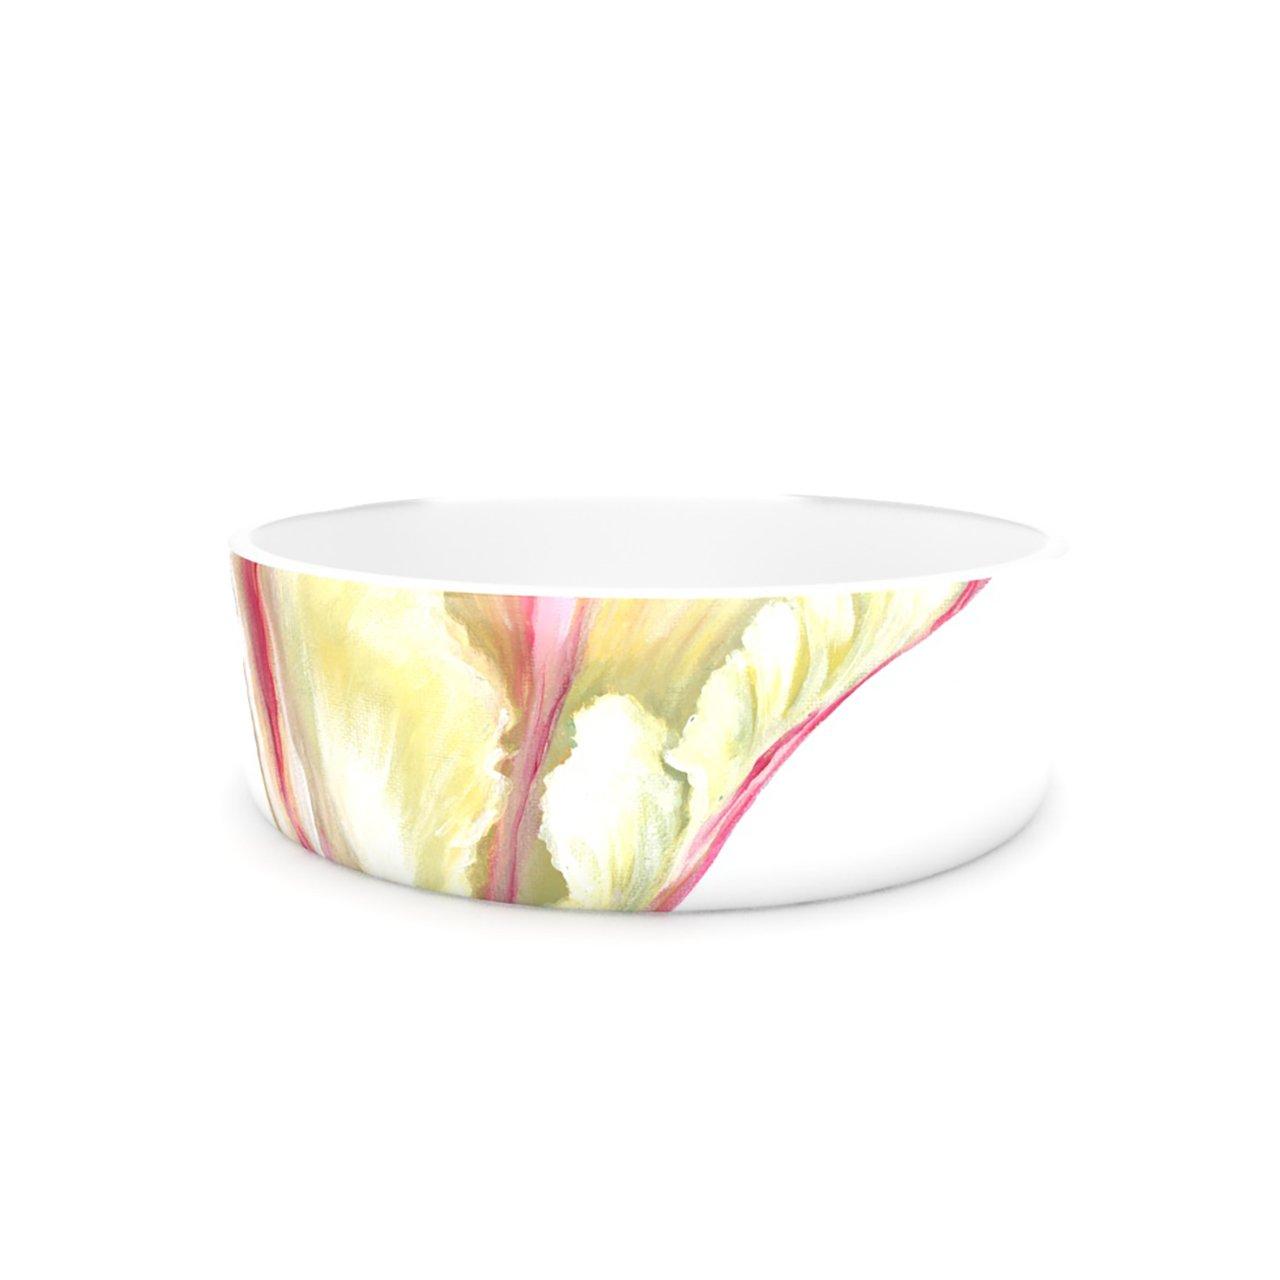 Kess InHouse Lydia Martin Red Tip Tulip Pet Bowl, 7-Inch